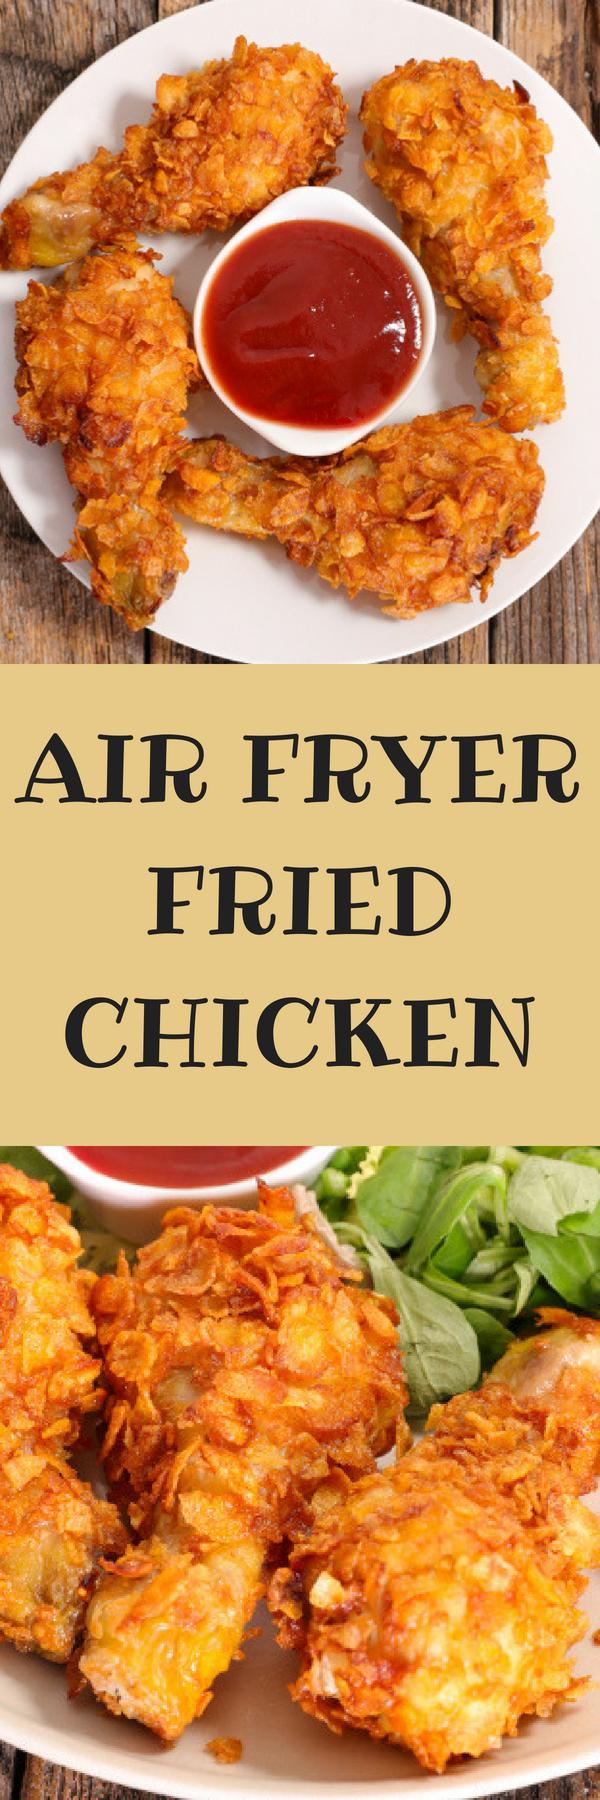 Crispy Air Fryer Fried Chicken Recipe Air fryer fried